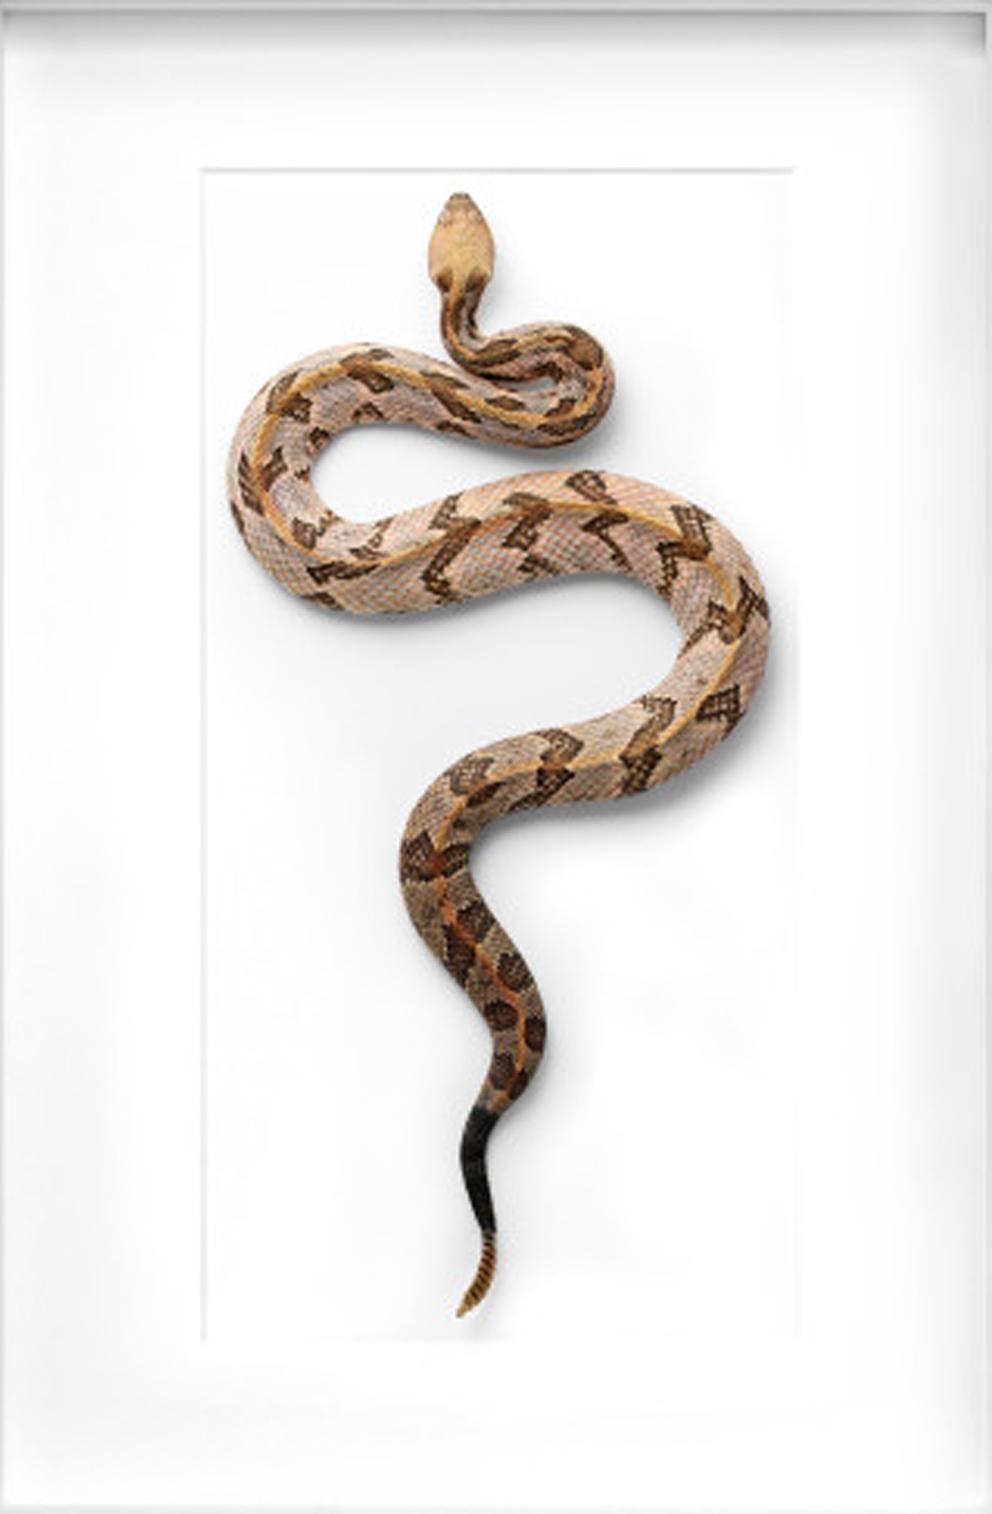 Canebrake Rattlesnake  by Christopher Marley